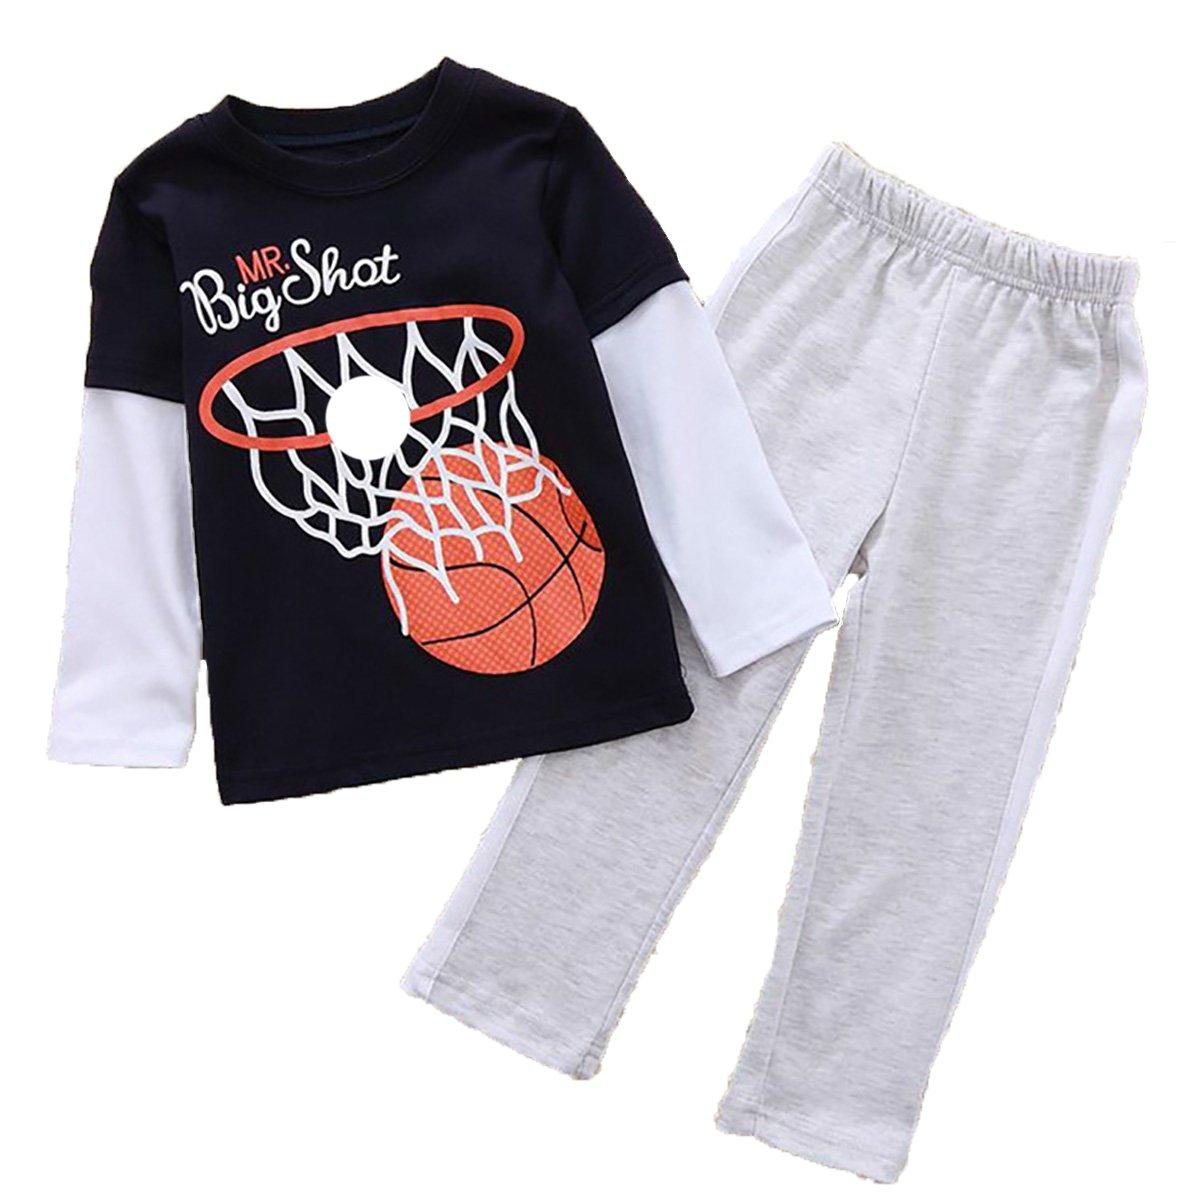 Captain Meow Boys Long Sleeve Clothing Set T-shirt And Pants Basketball